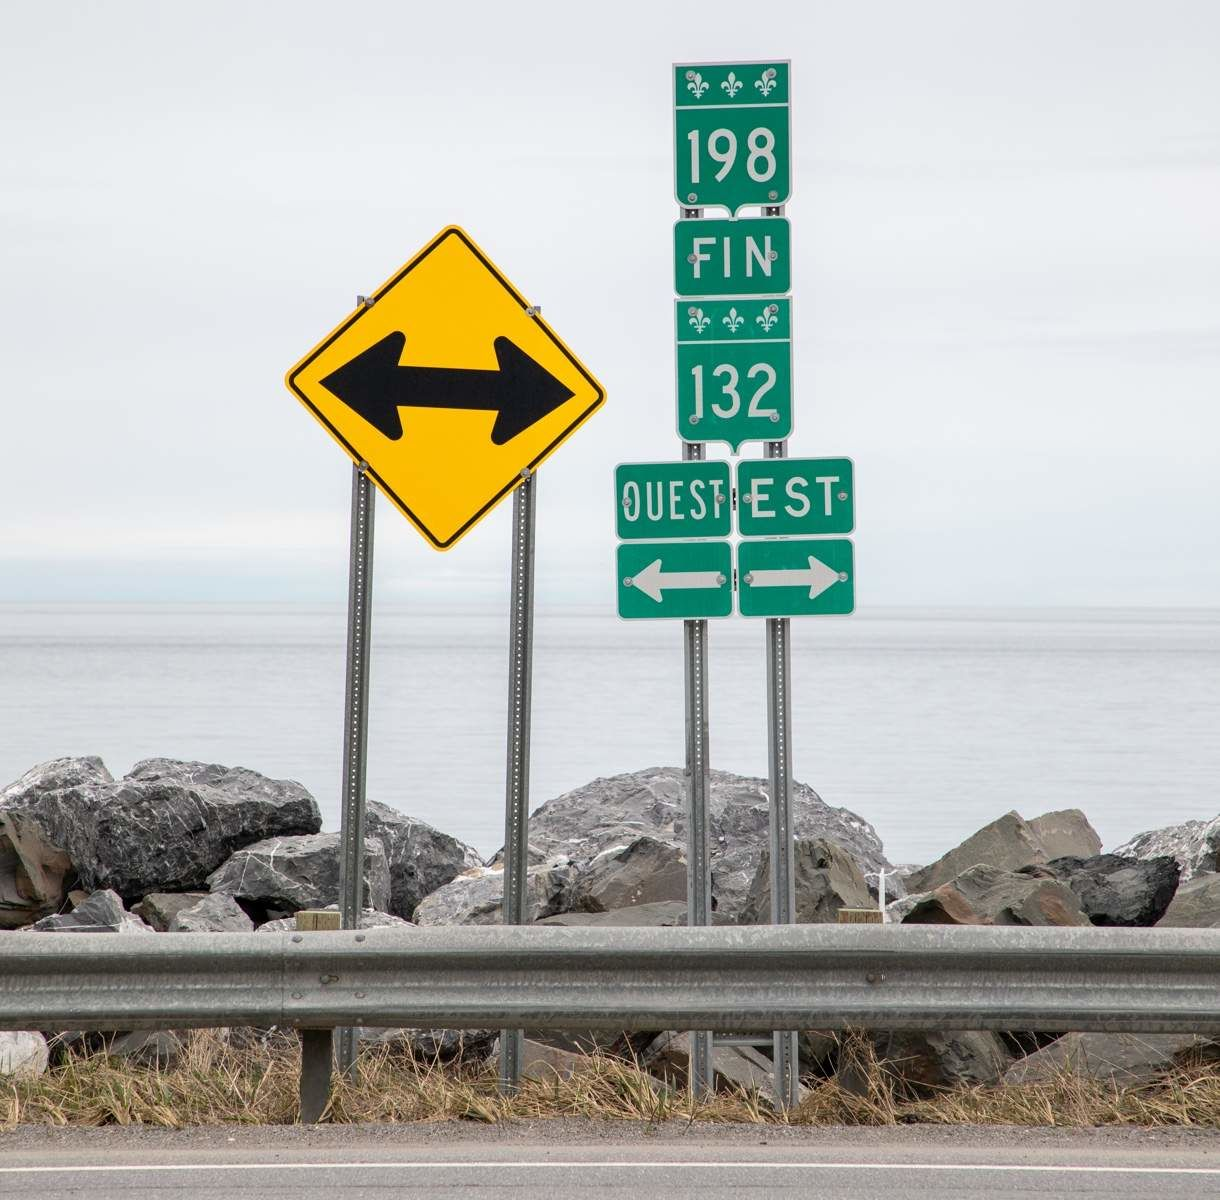 Route 132 in Quebec